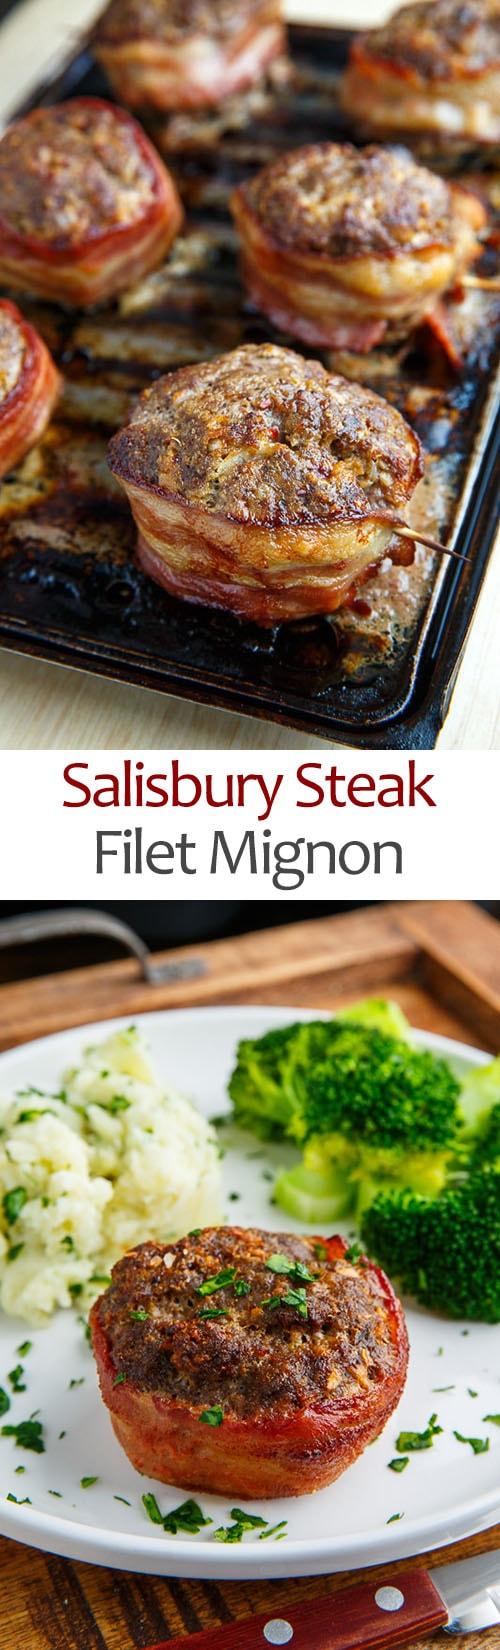 Salisbury Steak Filet Mignon